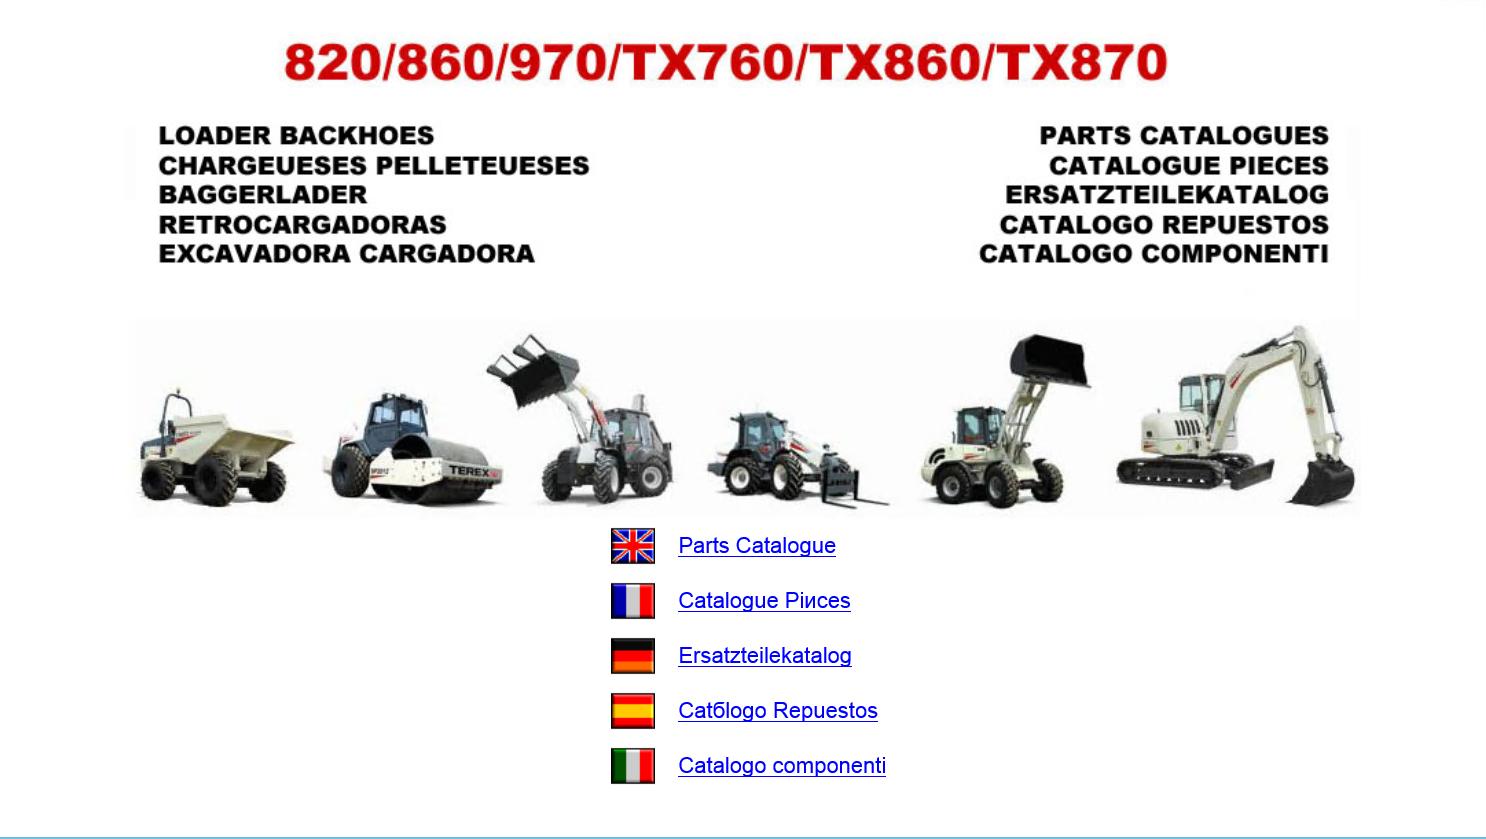 spare parts catalog Terex Americas & Fermec Loader Backhoes Parts Catalogues